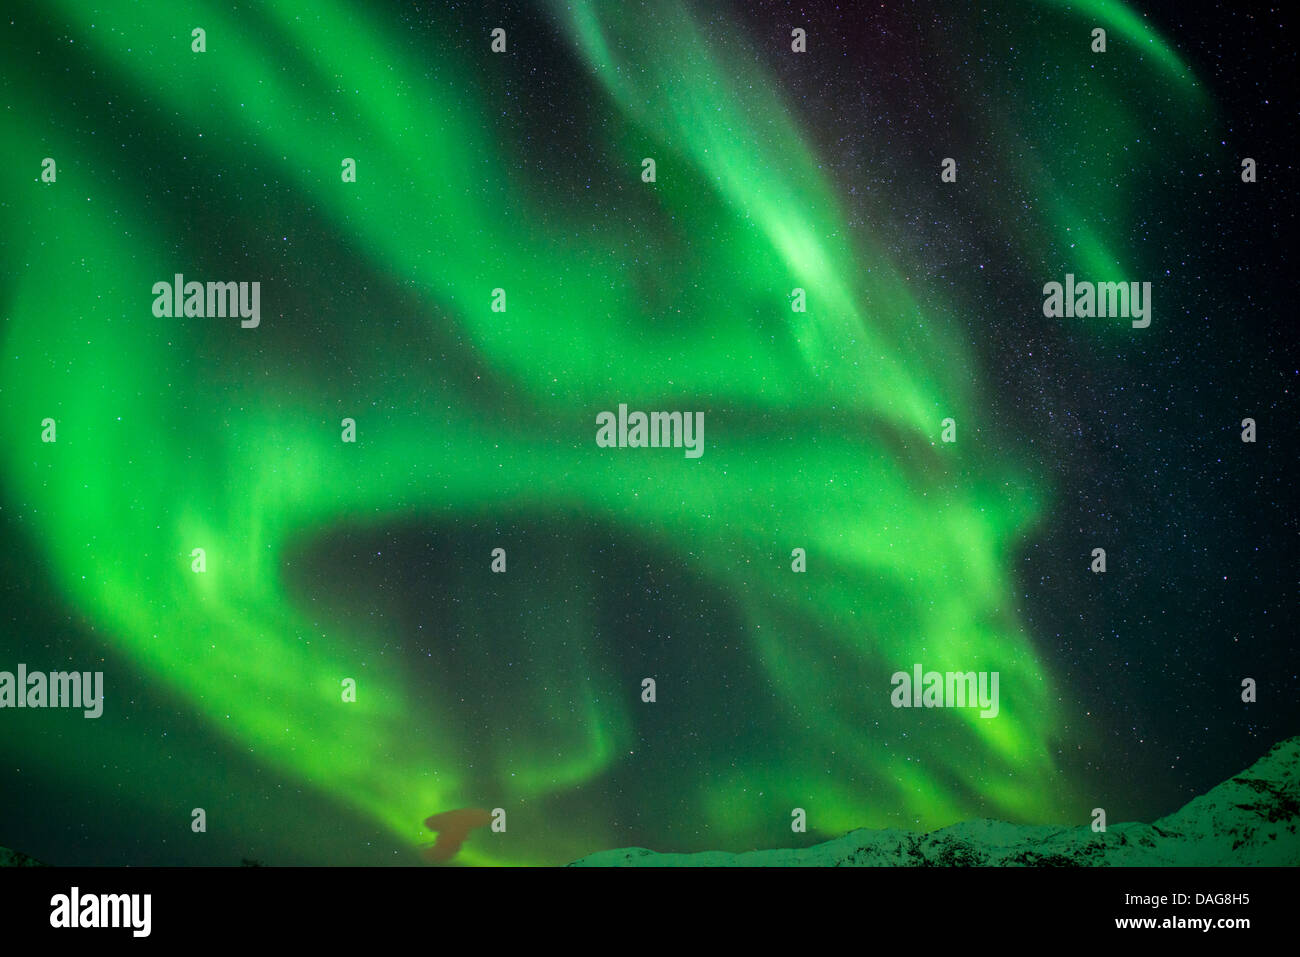 aurora bows and rays in front of the milky way, Norway, Troms, Kvaloeya, Kattfjordeidet - Stock Image